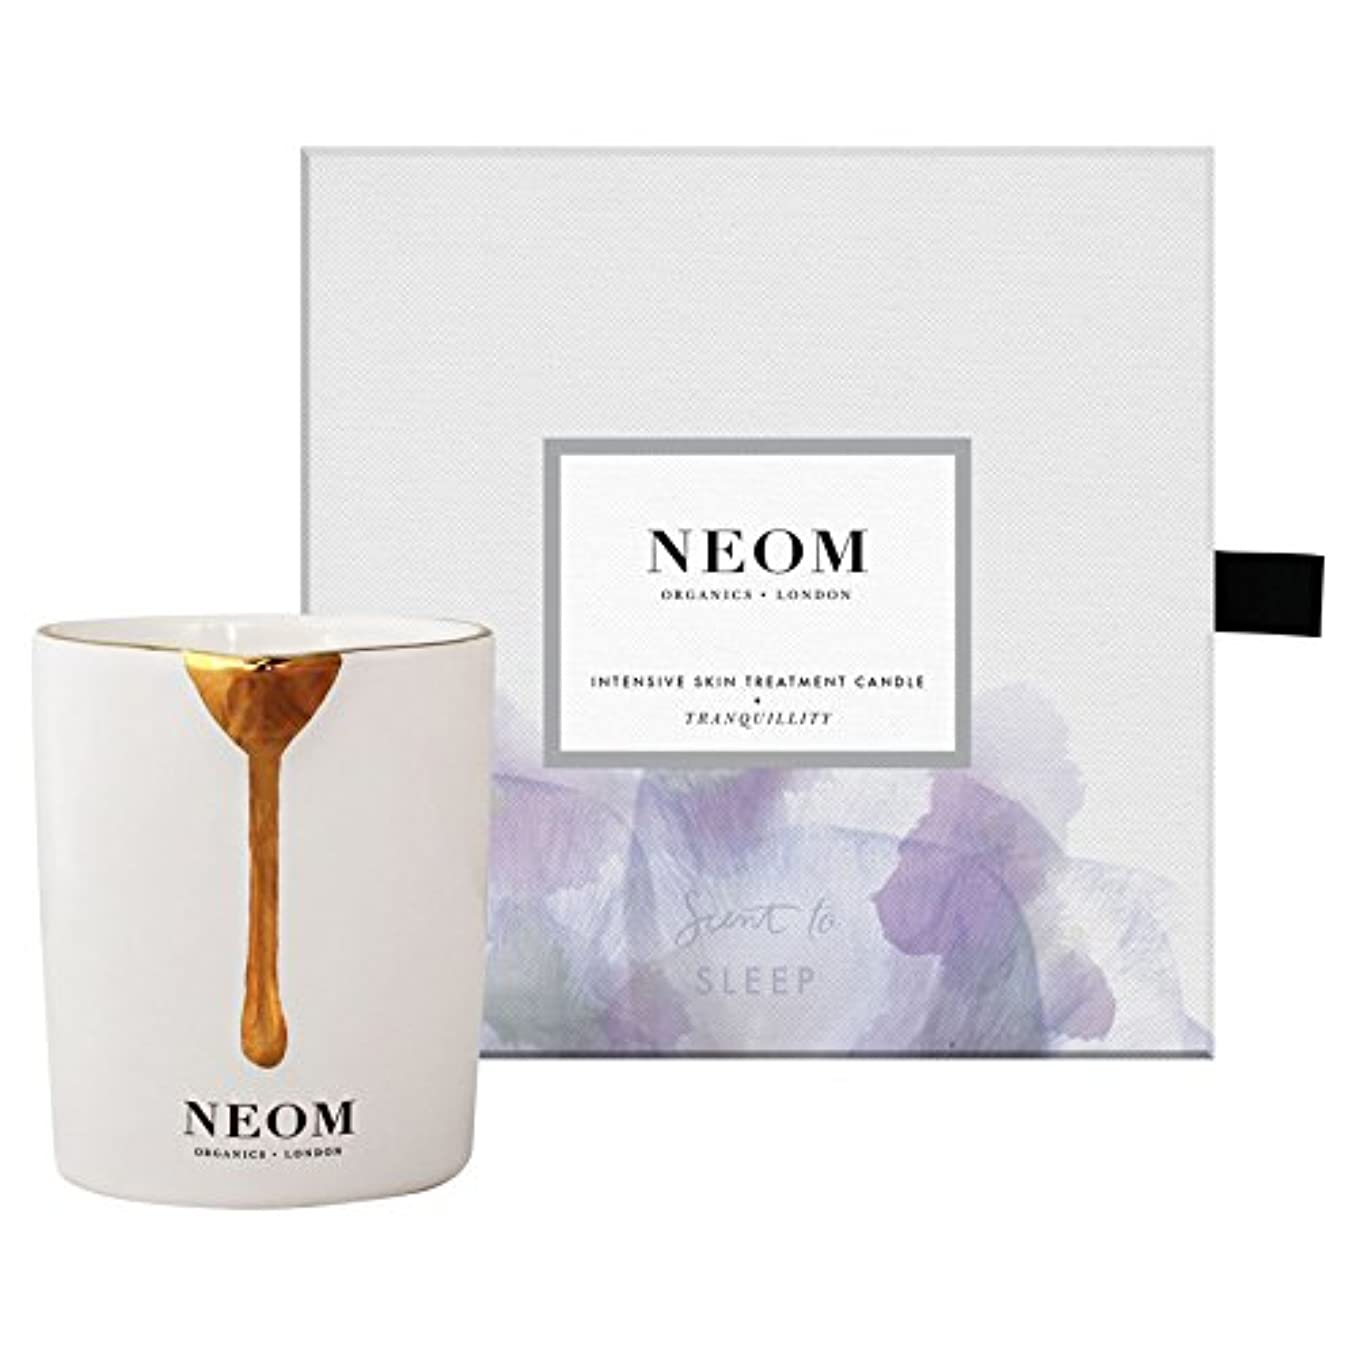 [Neom] Neom静けさのスキントリートメントキャンドル - Neom Tranquility Skin Treatment Candle [並行輸入品]